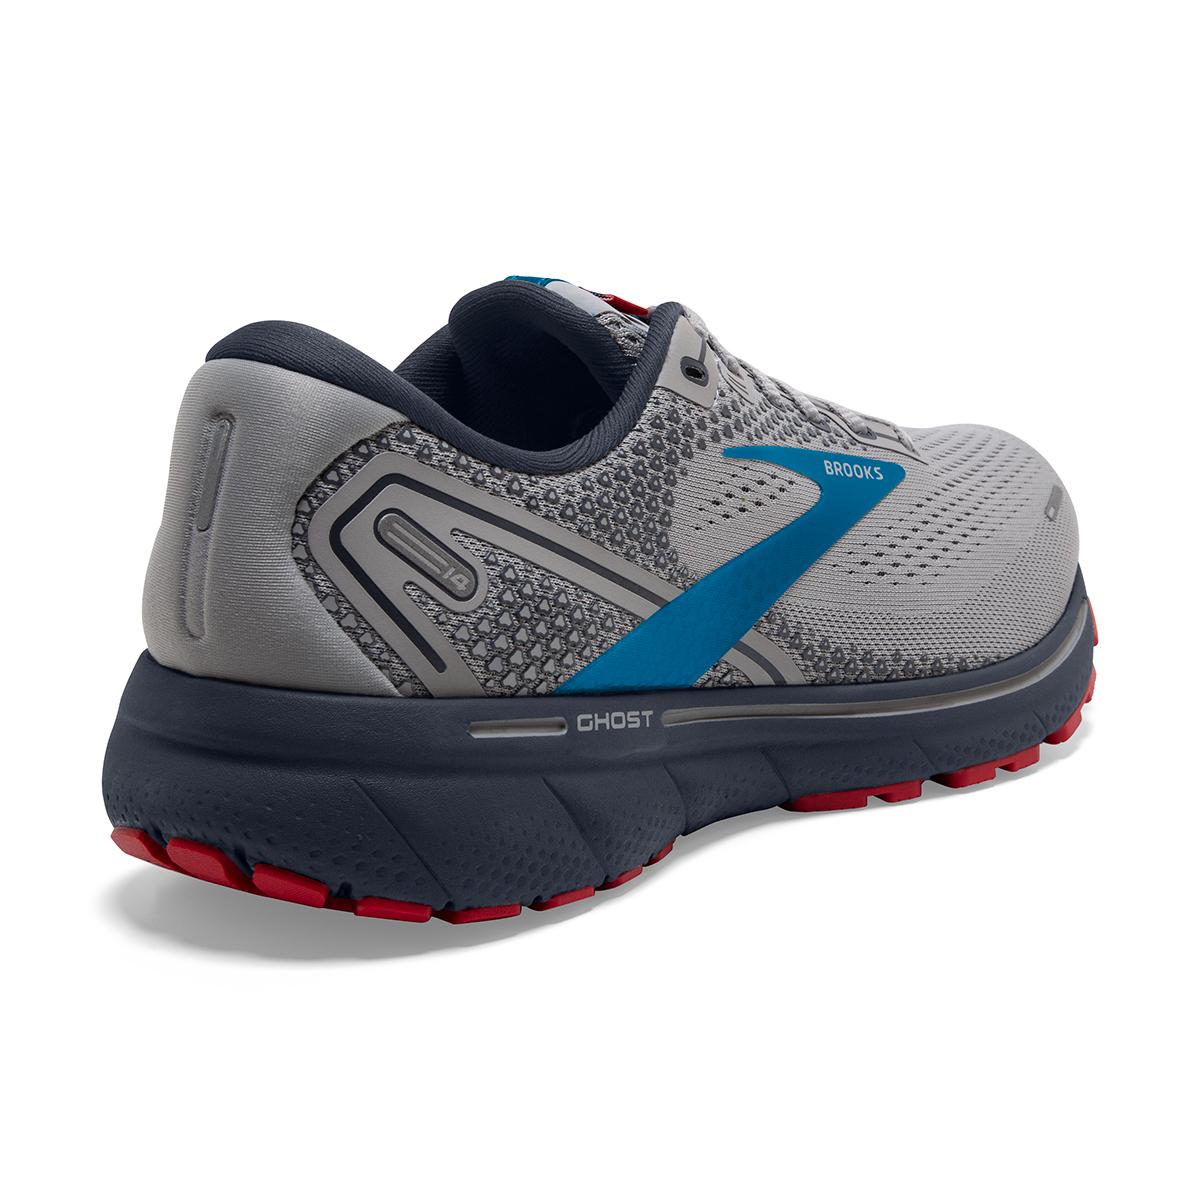 Men's Brooks Ghost 14 Running Shoe - Color: Grey/Blue/Red - Size: 7 - Width: Regular, Grey/Blue/Red, large, image 6